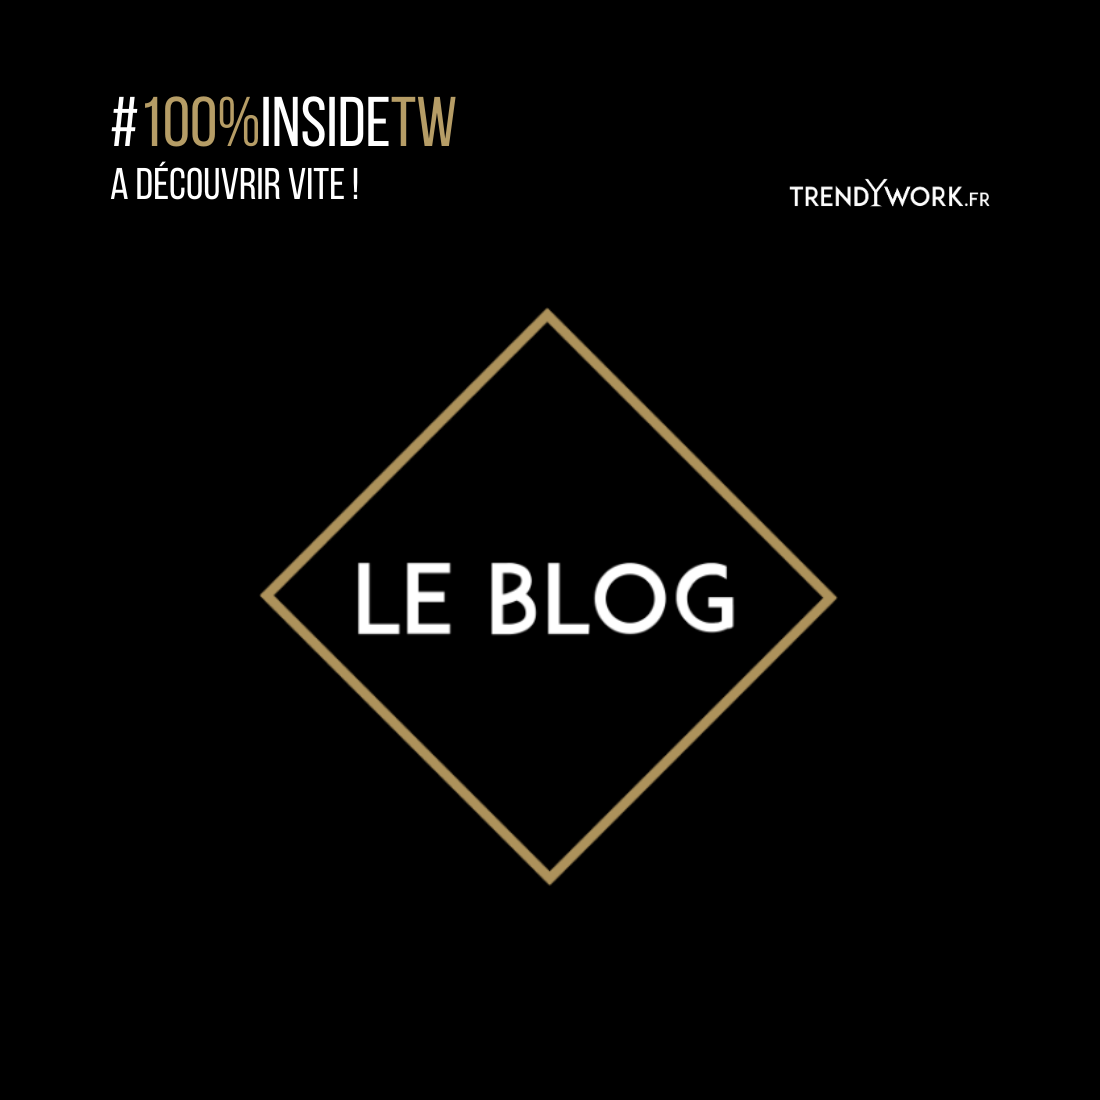 TrendyBlog - Trendywork LeBlog